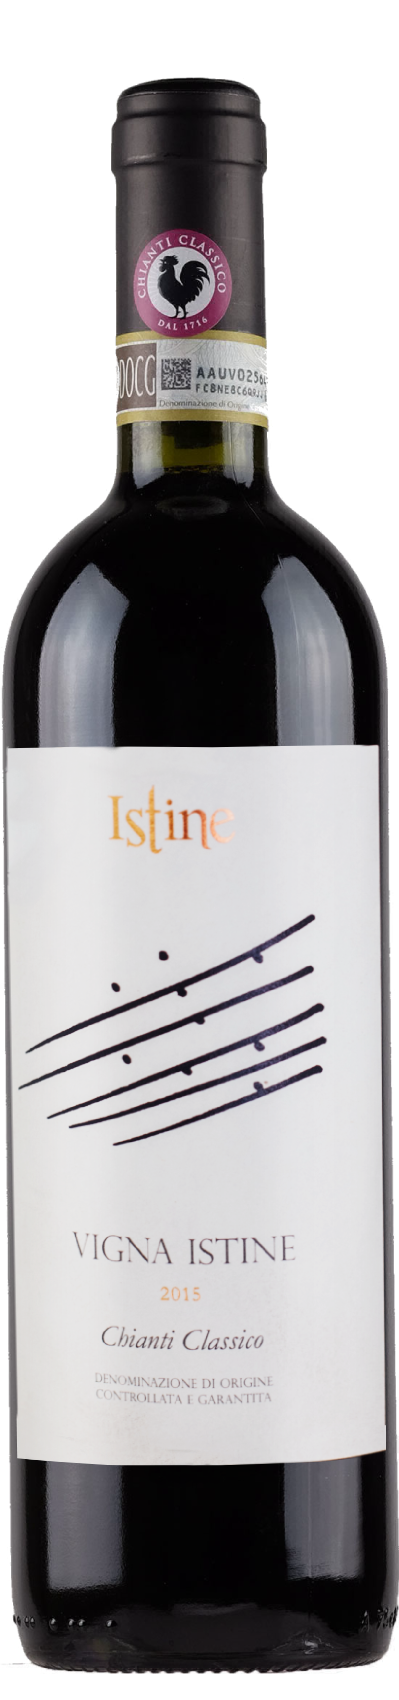 Istine Vigna Istine Chianti Classico - магазин склад winewine